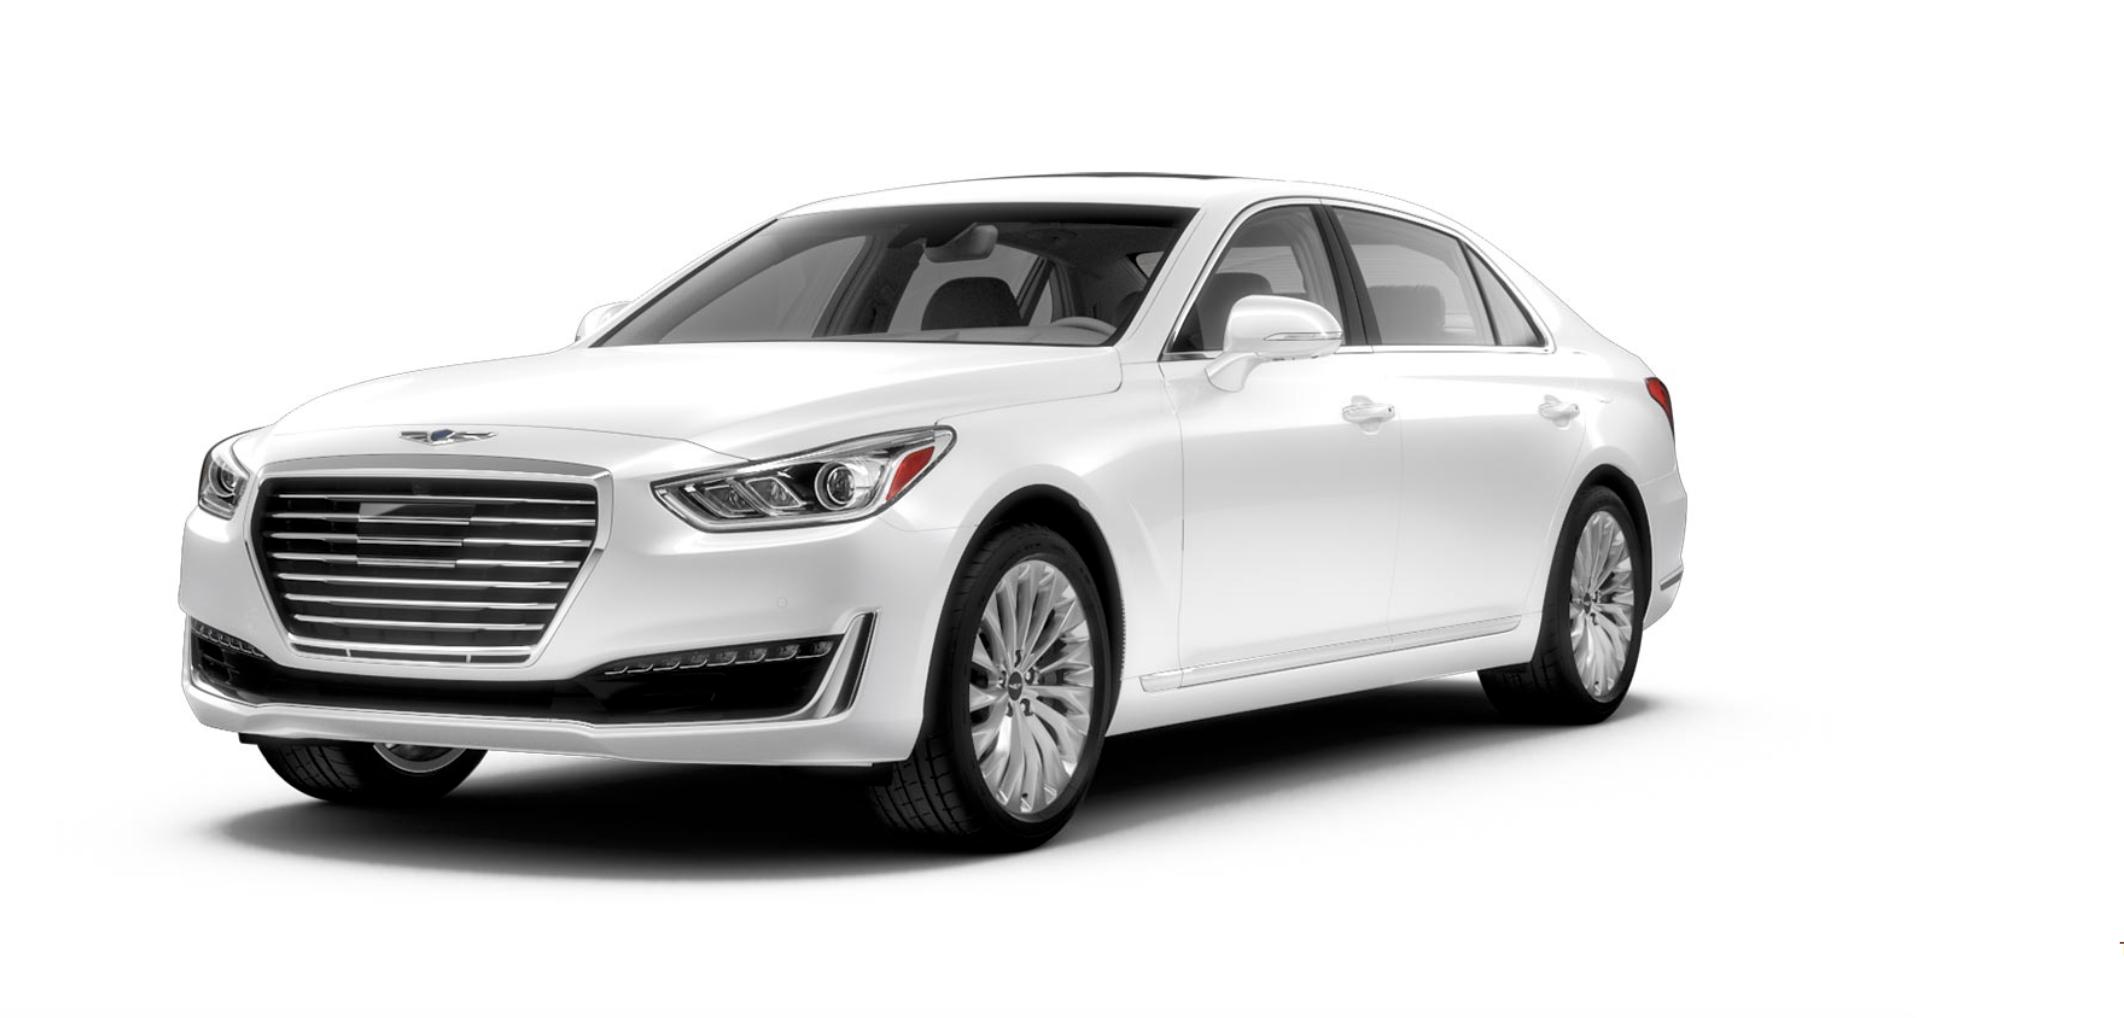 Genesis At New York International Auto Show GenesisNYIAS Mom Most - Car show 2018 nyc